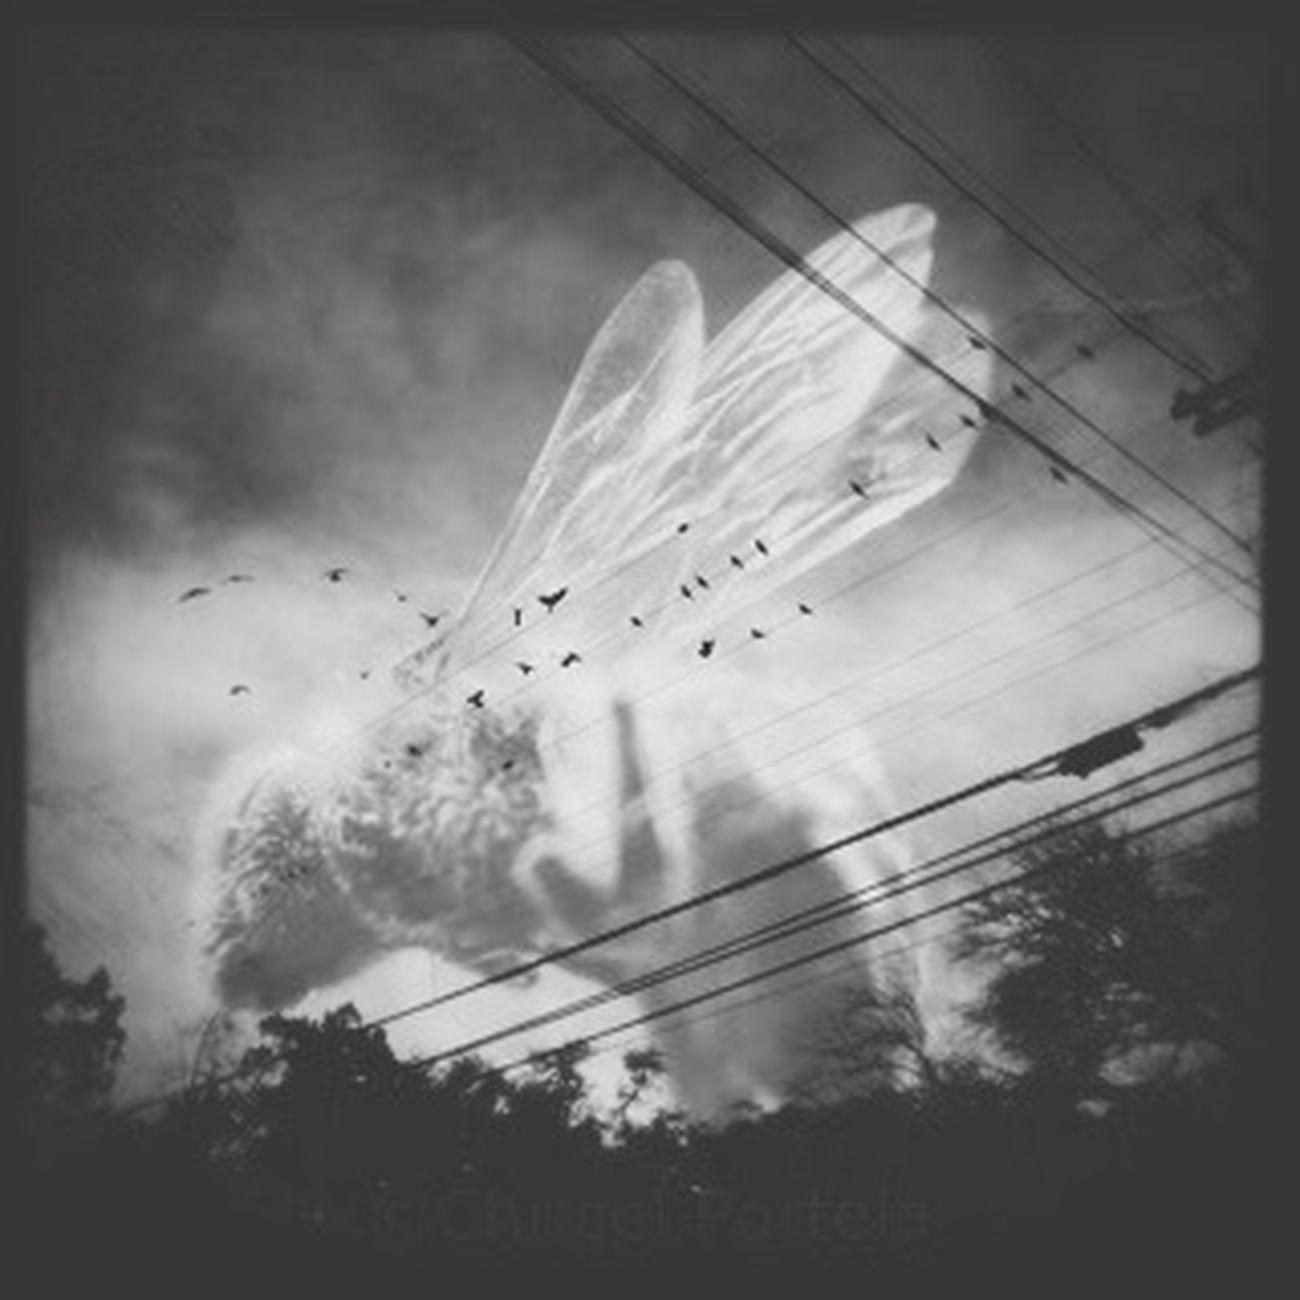 Birds Bees Bijoucep Sky Blackandwhite Noir Et Blanc Fragility Wings Nature